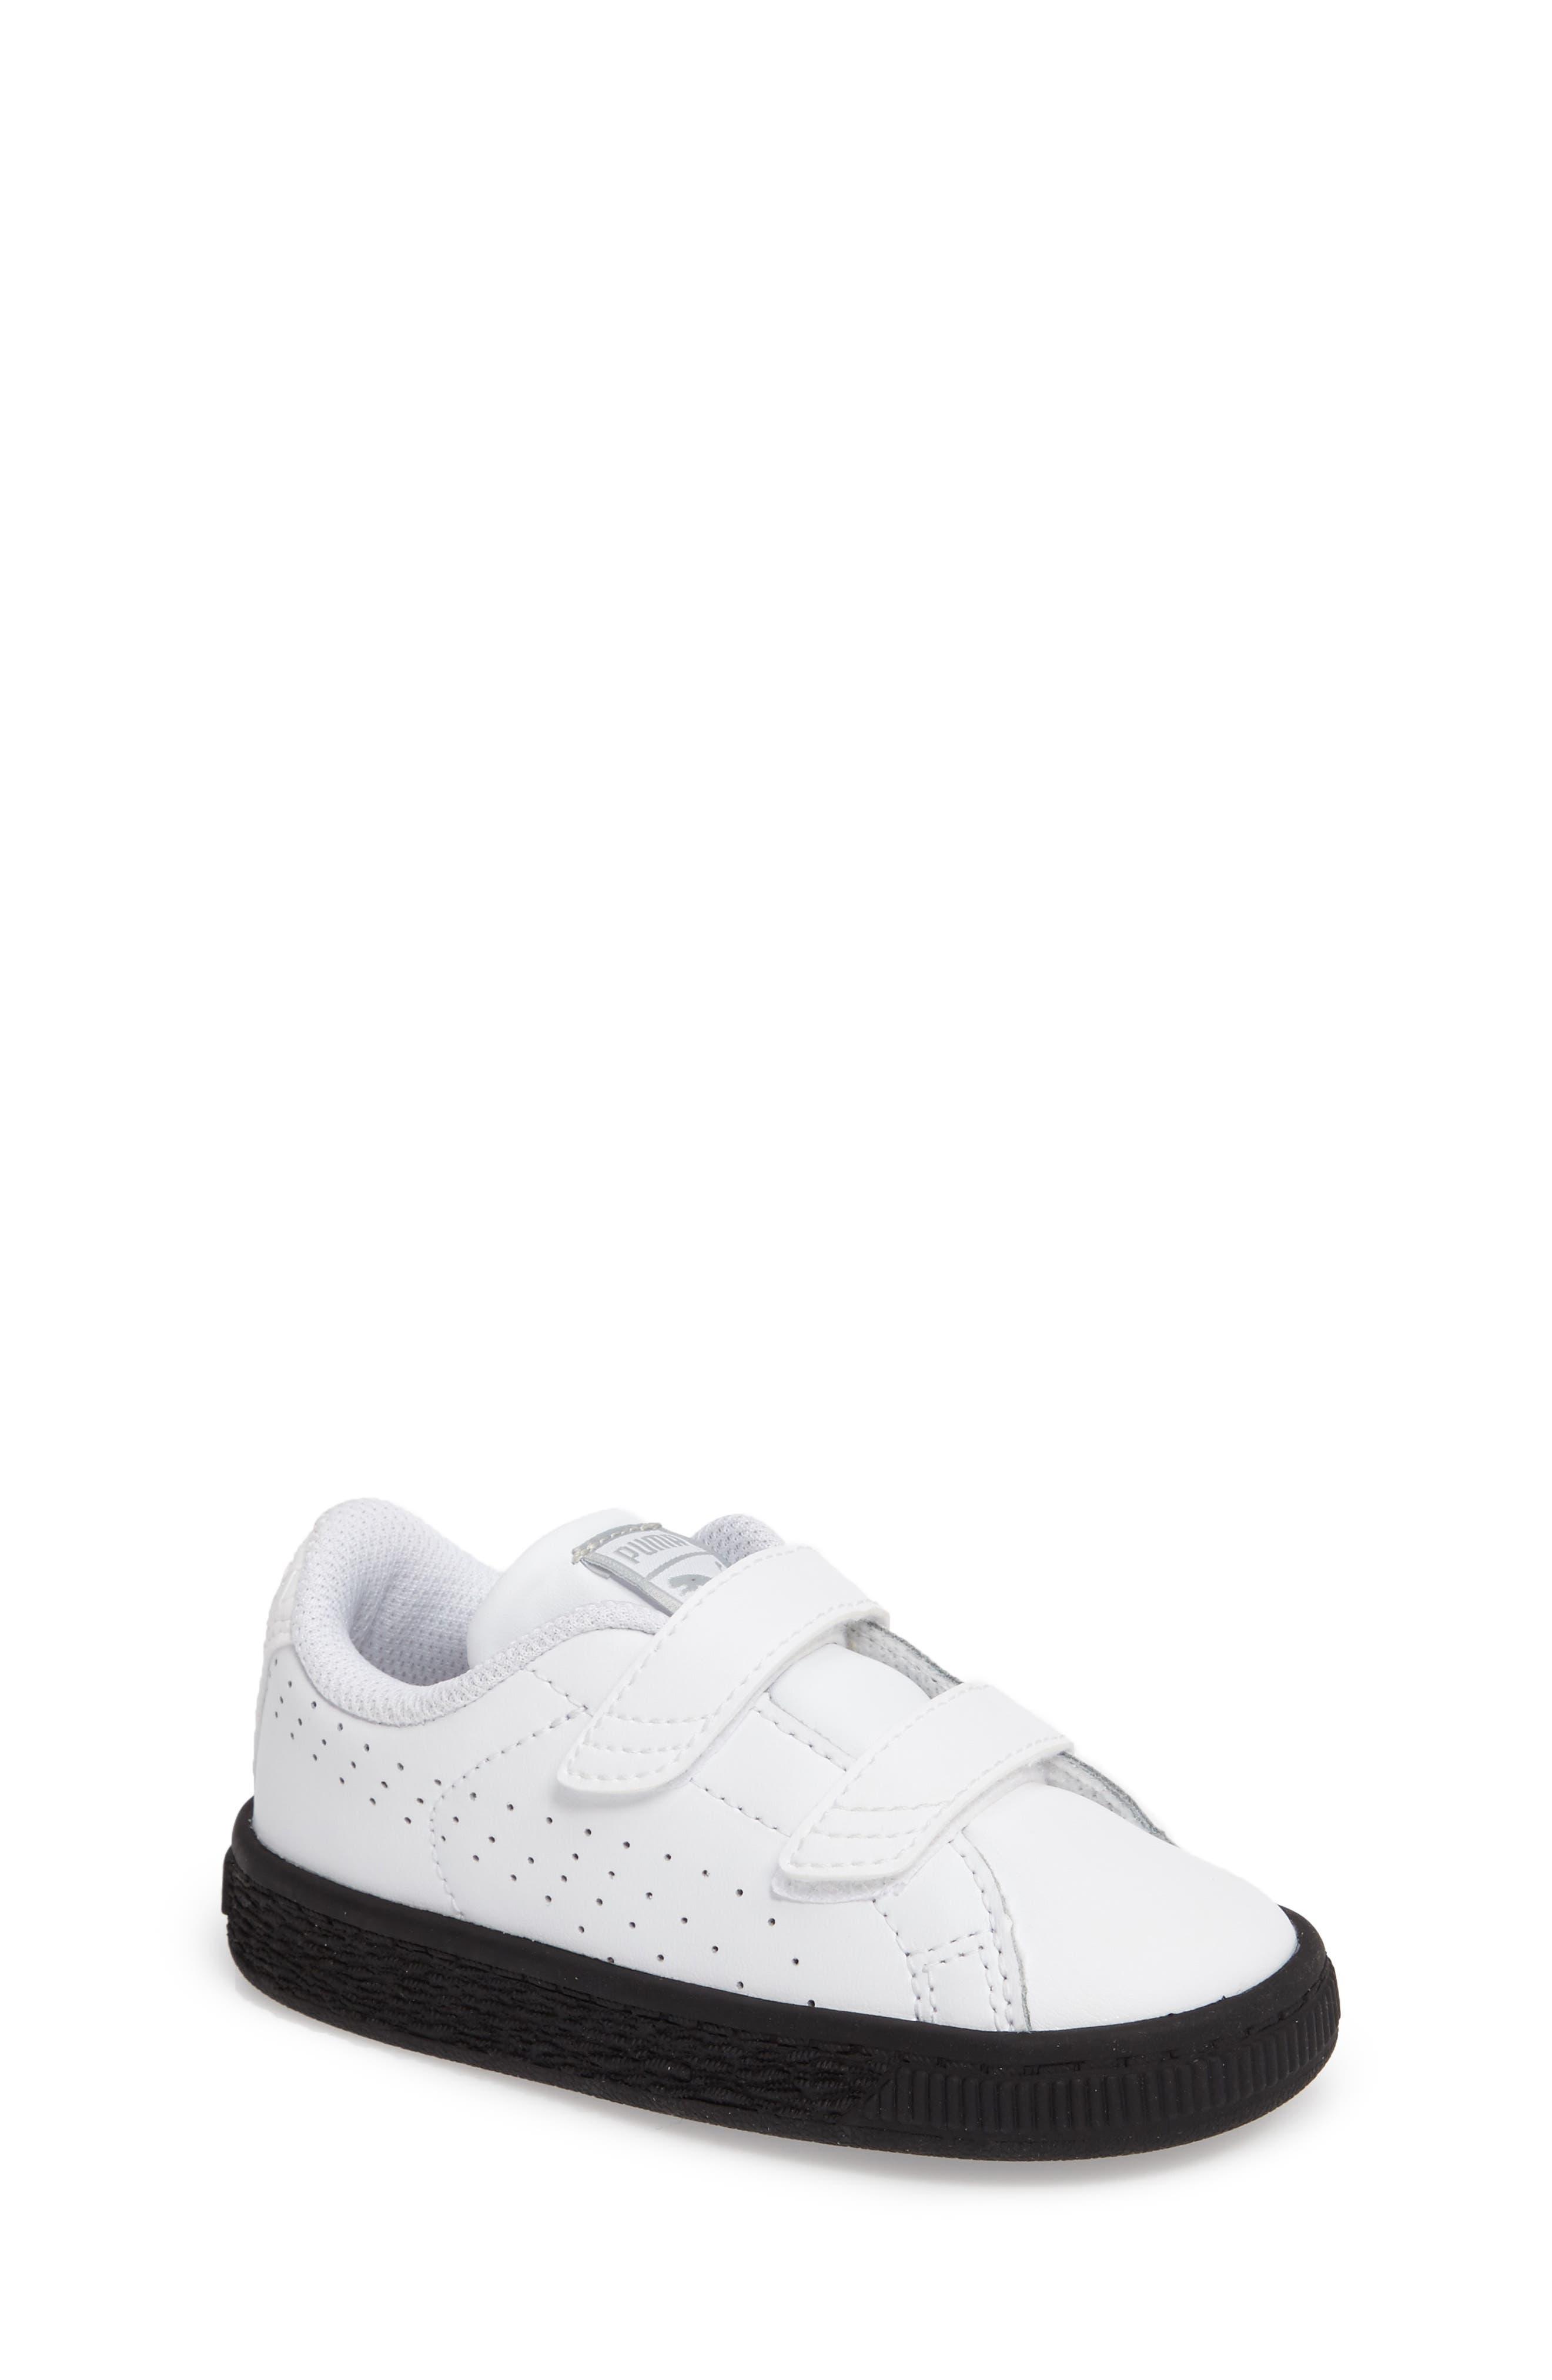 Basket Classic Sneaker,                             Main thumbnail 1, color,                             White